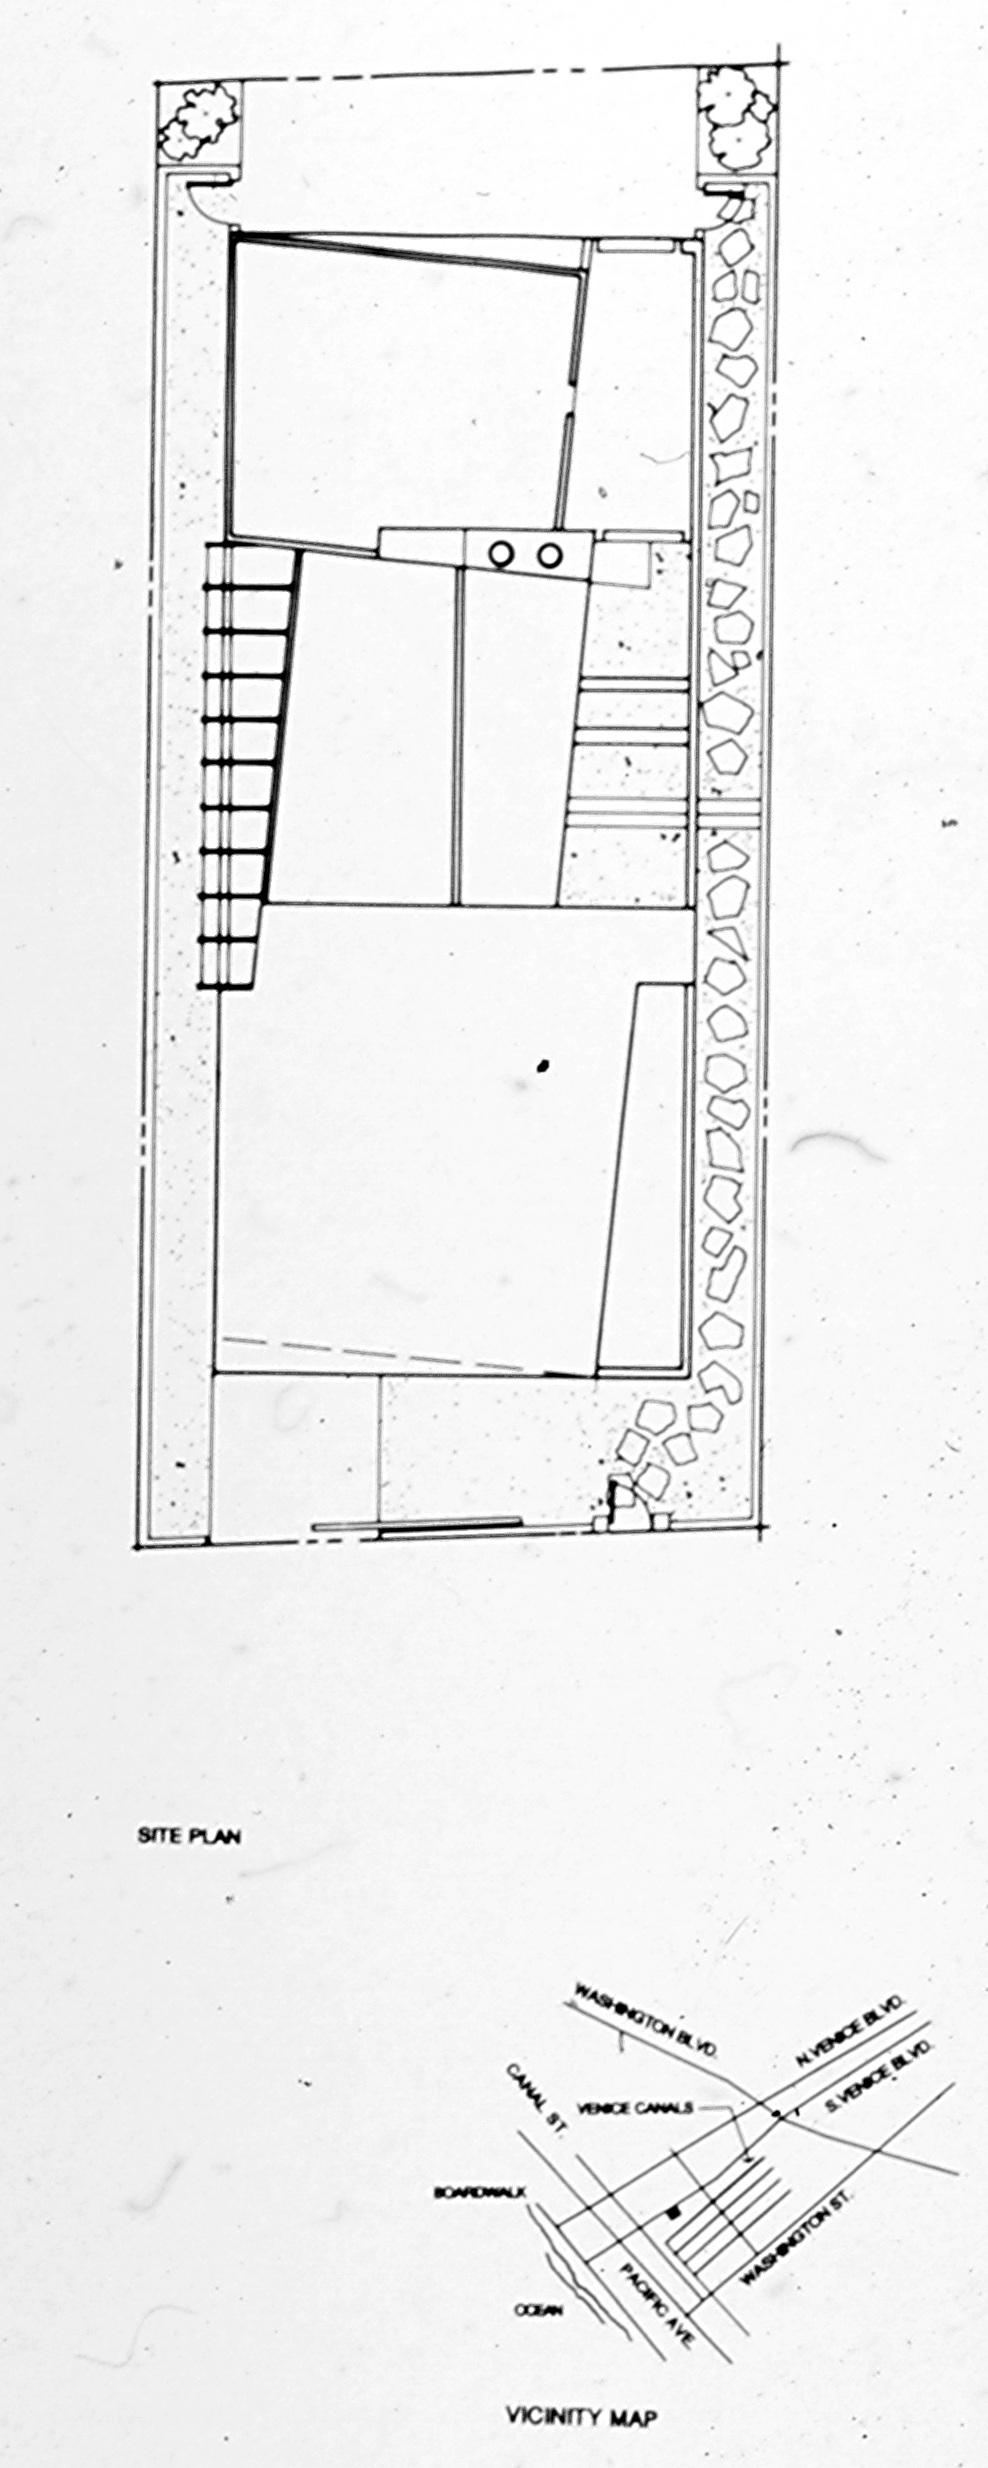 S.E.A.-Studio-Environmental-Architecture-David-Hertz-FAIA-Venable-House-Venice-Beach-sustainable-regenerative-restorative-design-residential-contemporary-modern-passive-systems-recycled-wood-concrete-green-building-canal-beachhouse-studioea-site-plan.jpg